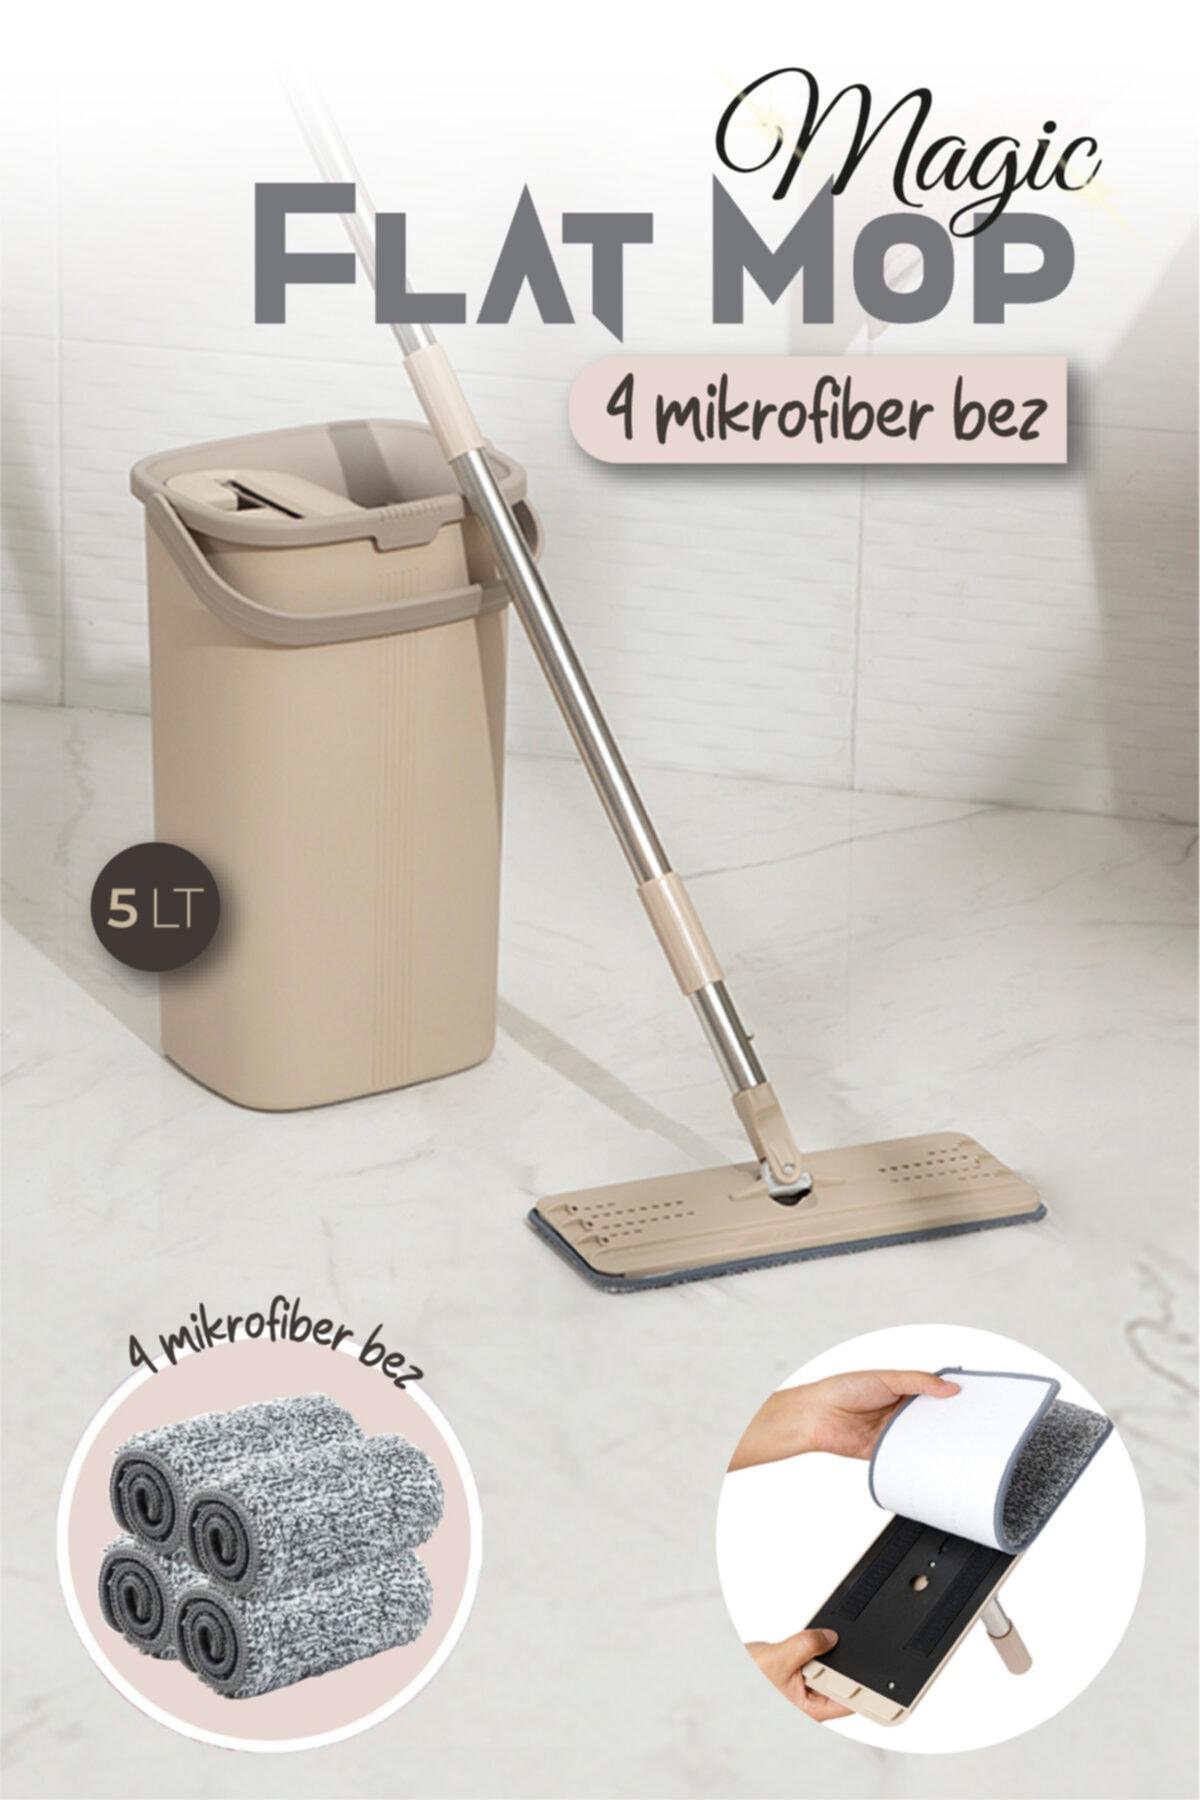 Magic Flat (Tablet) Mop Set 4 Microfiber Bez